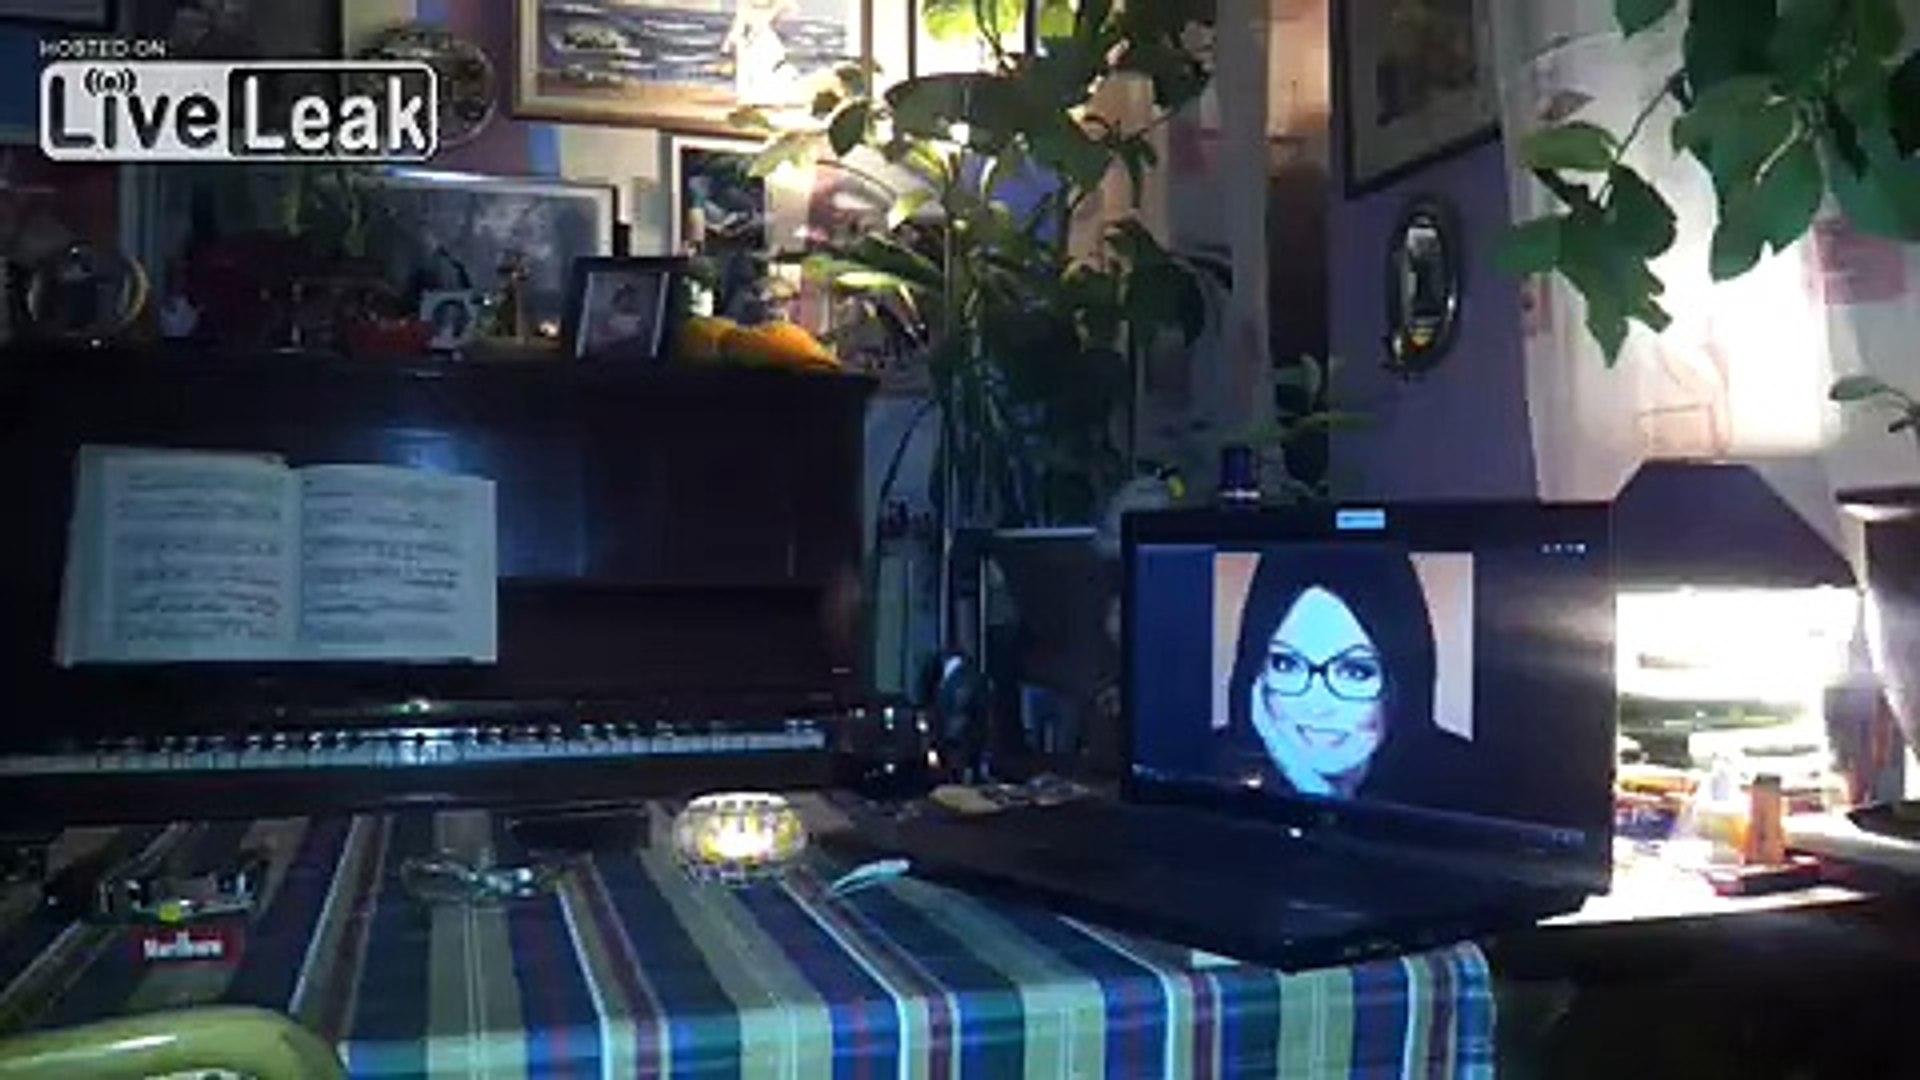 Elvis Presley - Nana Mouskouri - And I Love you So, covered with Harmonica.